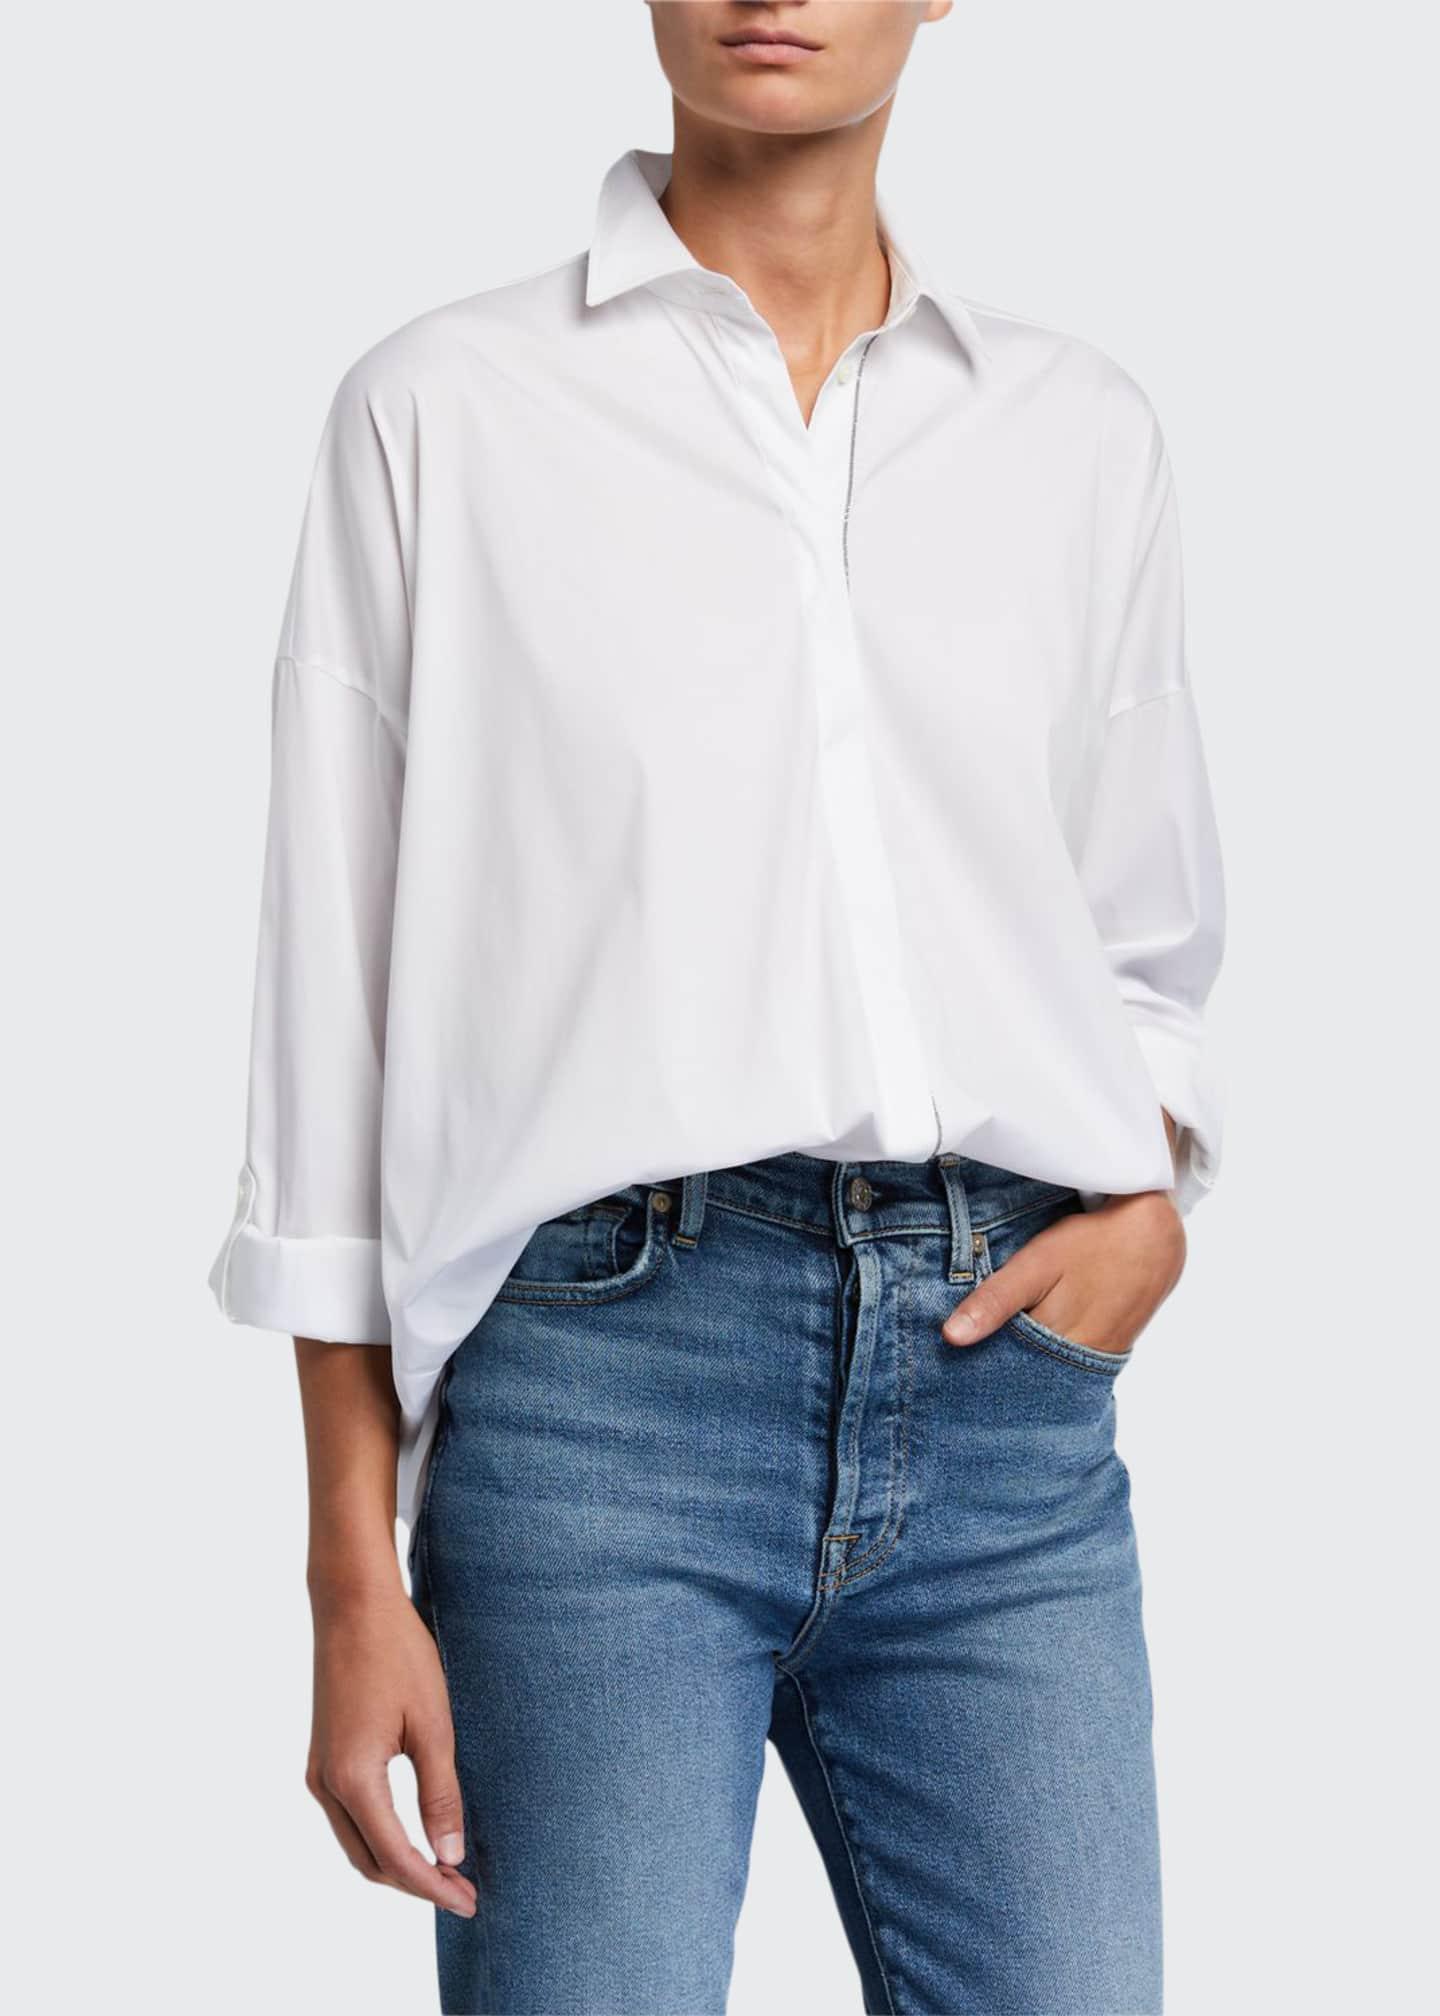 Brunello Cucinelli Cotton Poplin Boxy-Fit Shirt